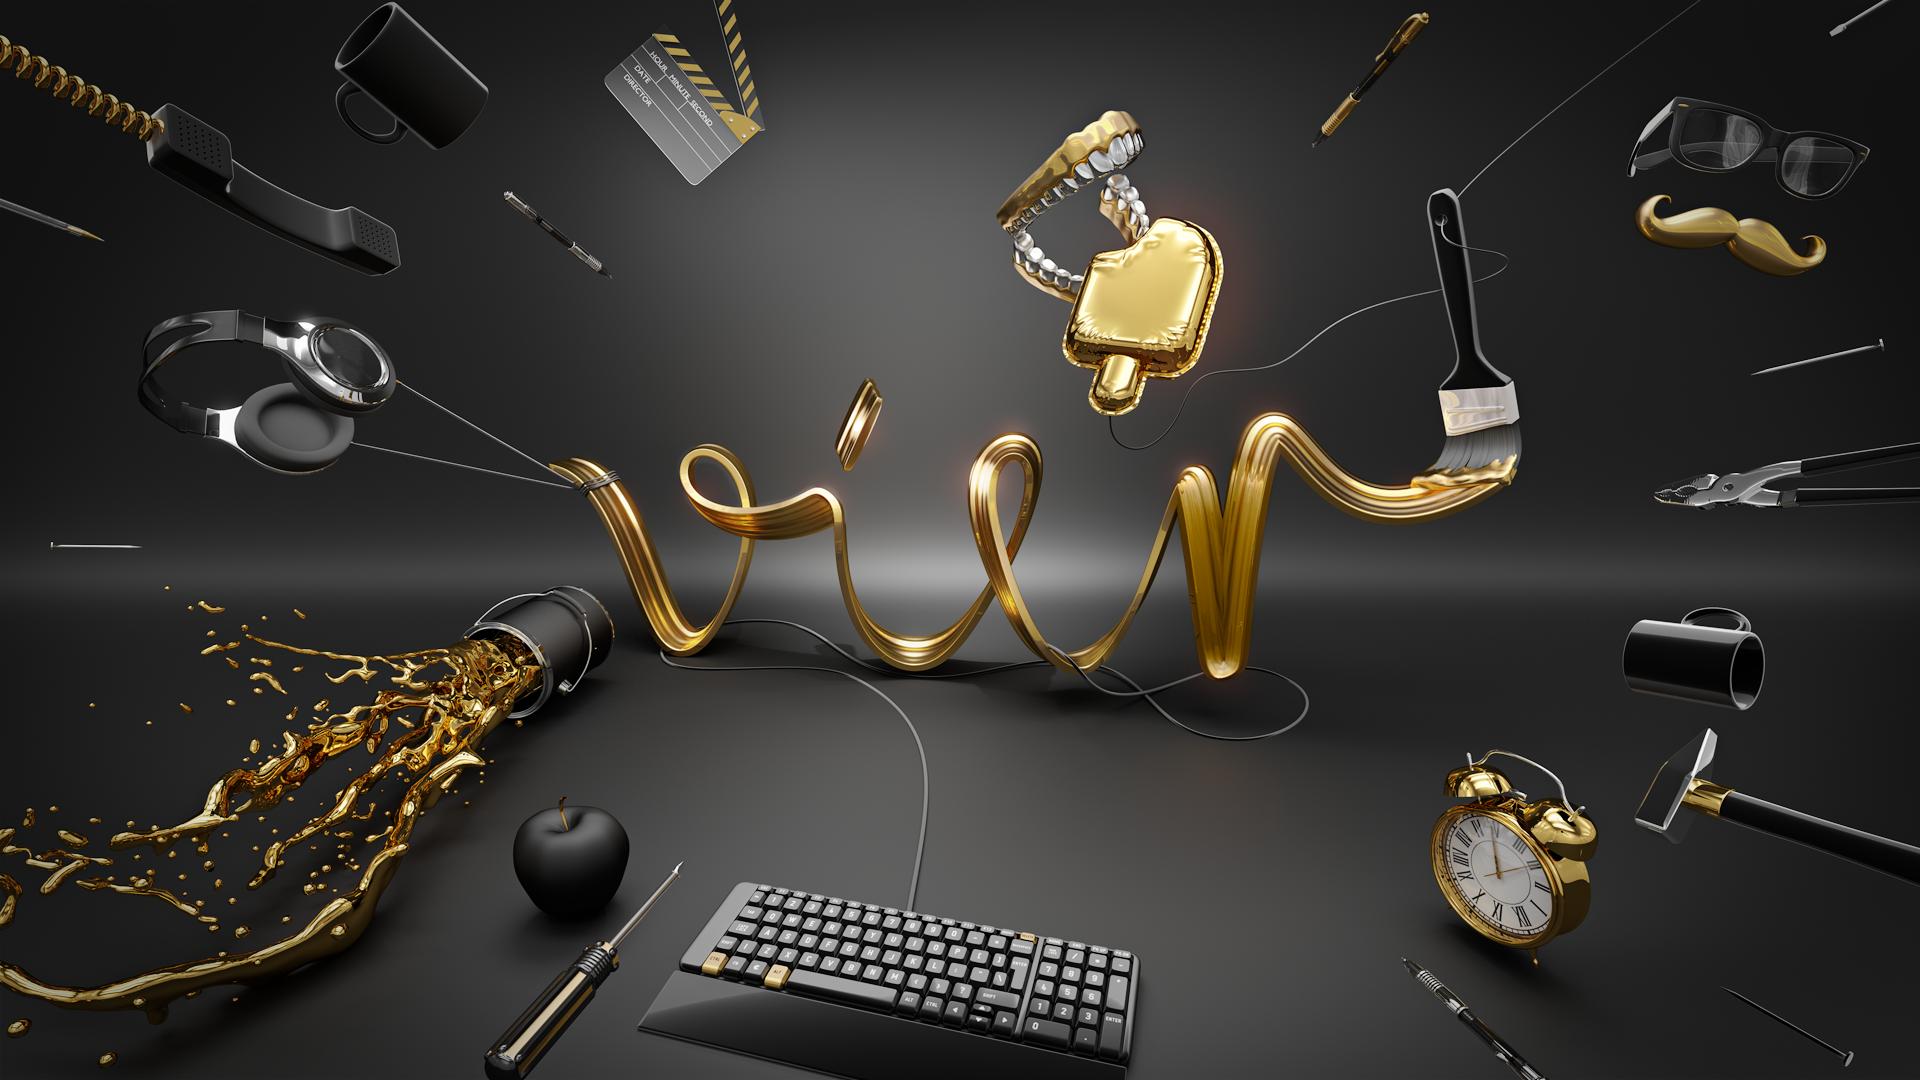 CGI Type Illustration